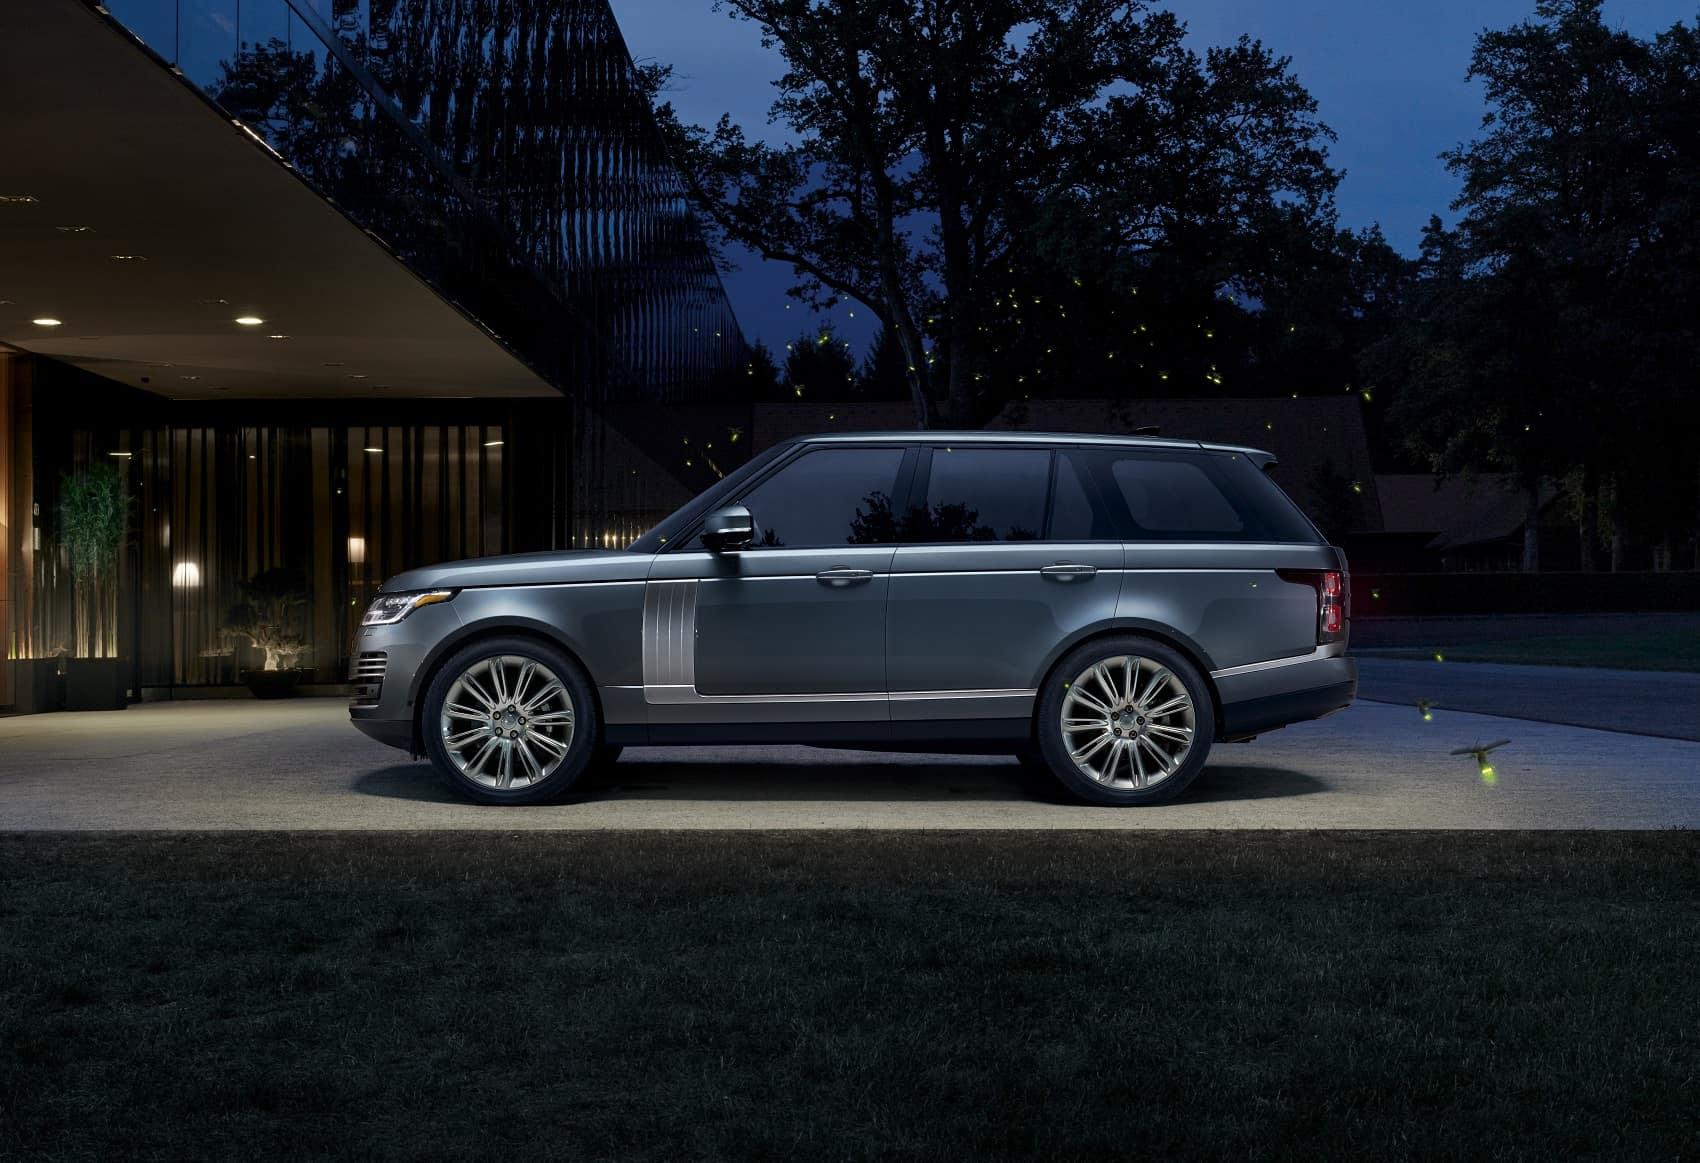 Range Rover MPG Efficiency